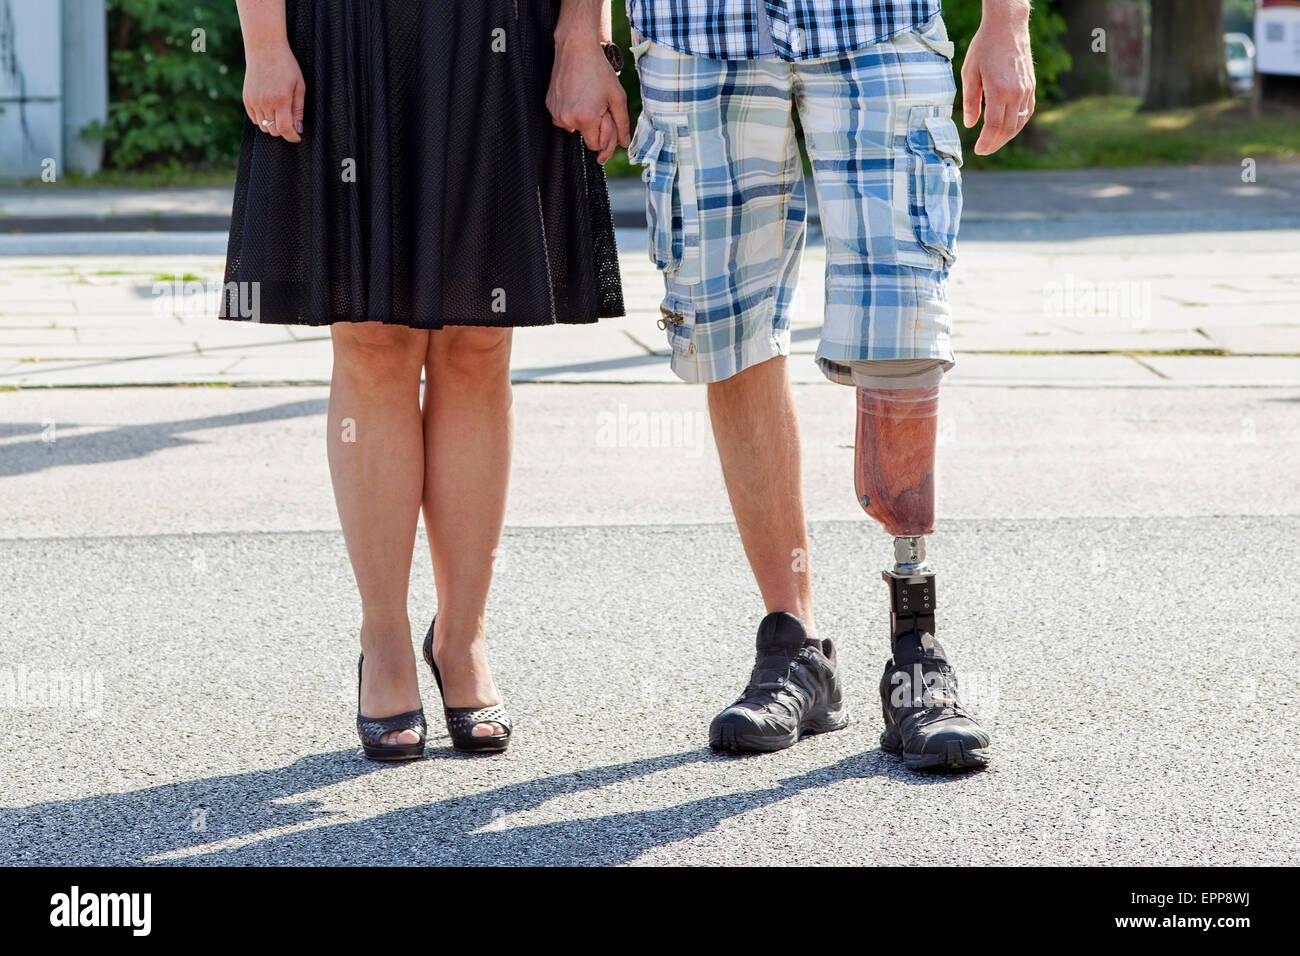 Amputiert frau hopping bein Behandlungsfehler: Ärzte